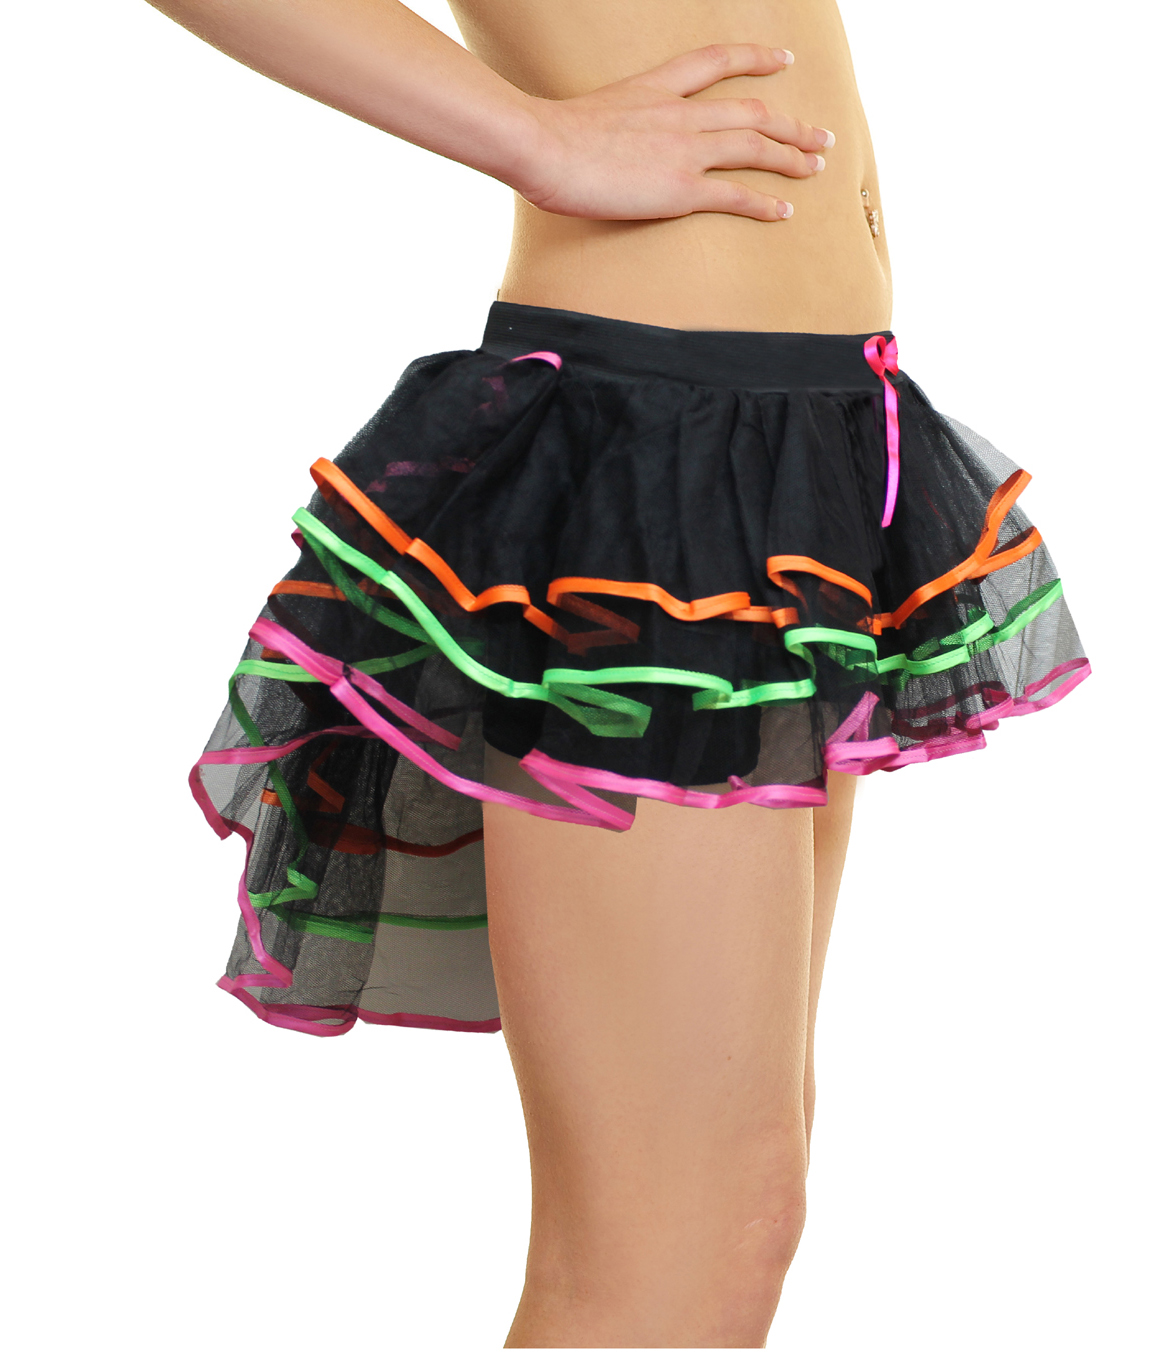 Crazy Chick 3 Layers Multicolour Burlesque TuTu Skirt With Multi Trim